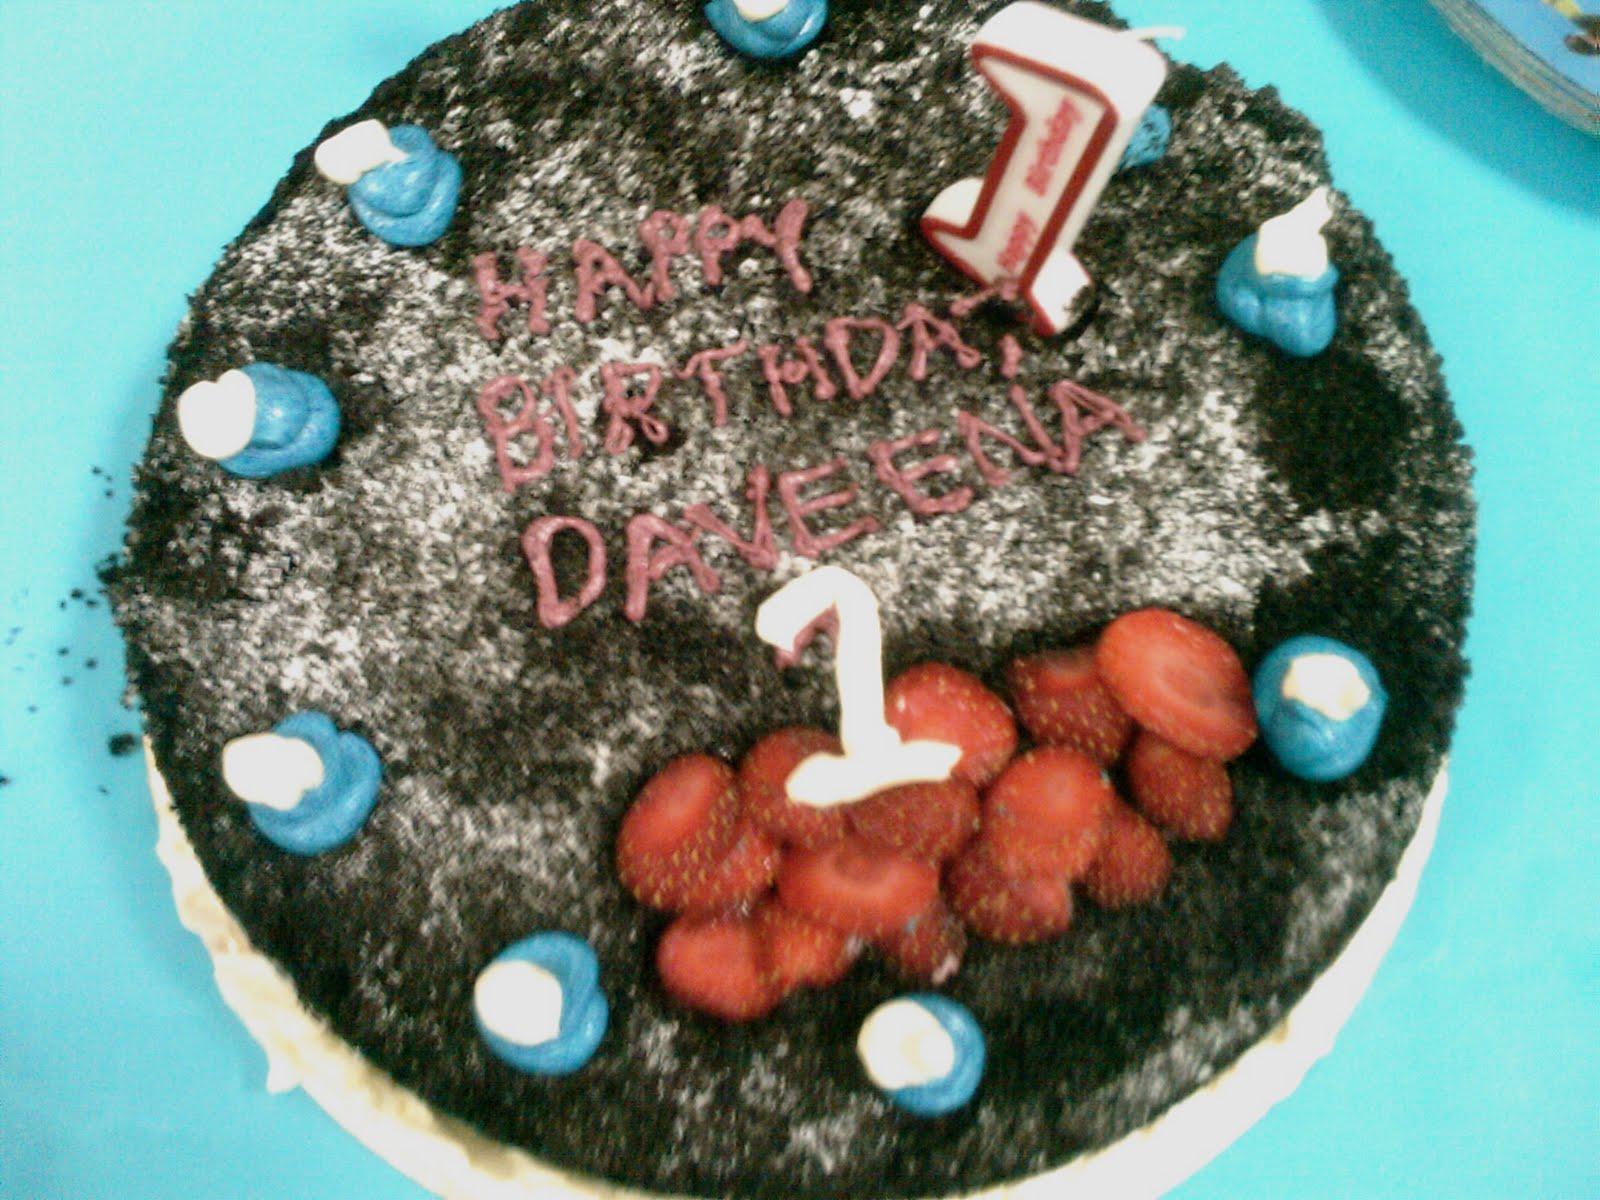 Shantis Homemade Cakes Homemade Birthday Cakes